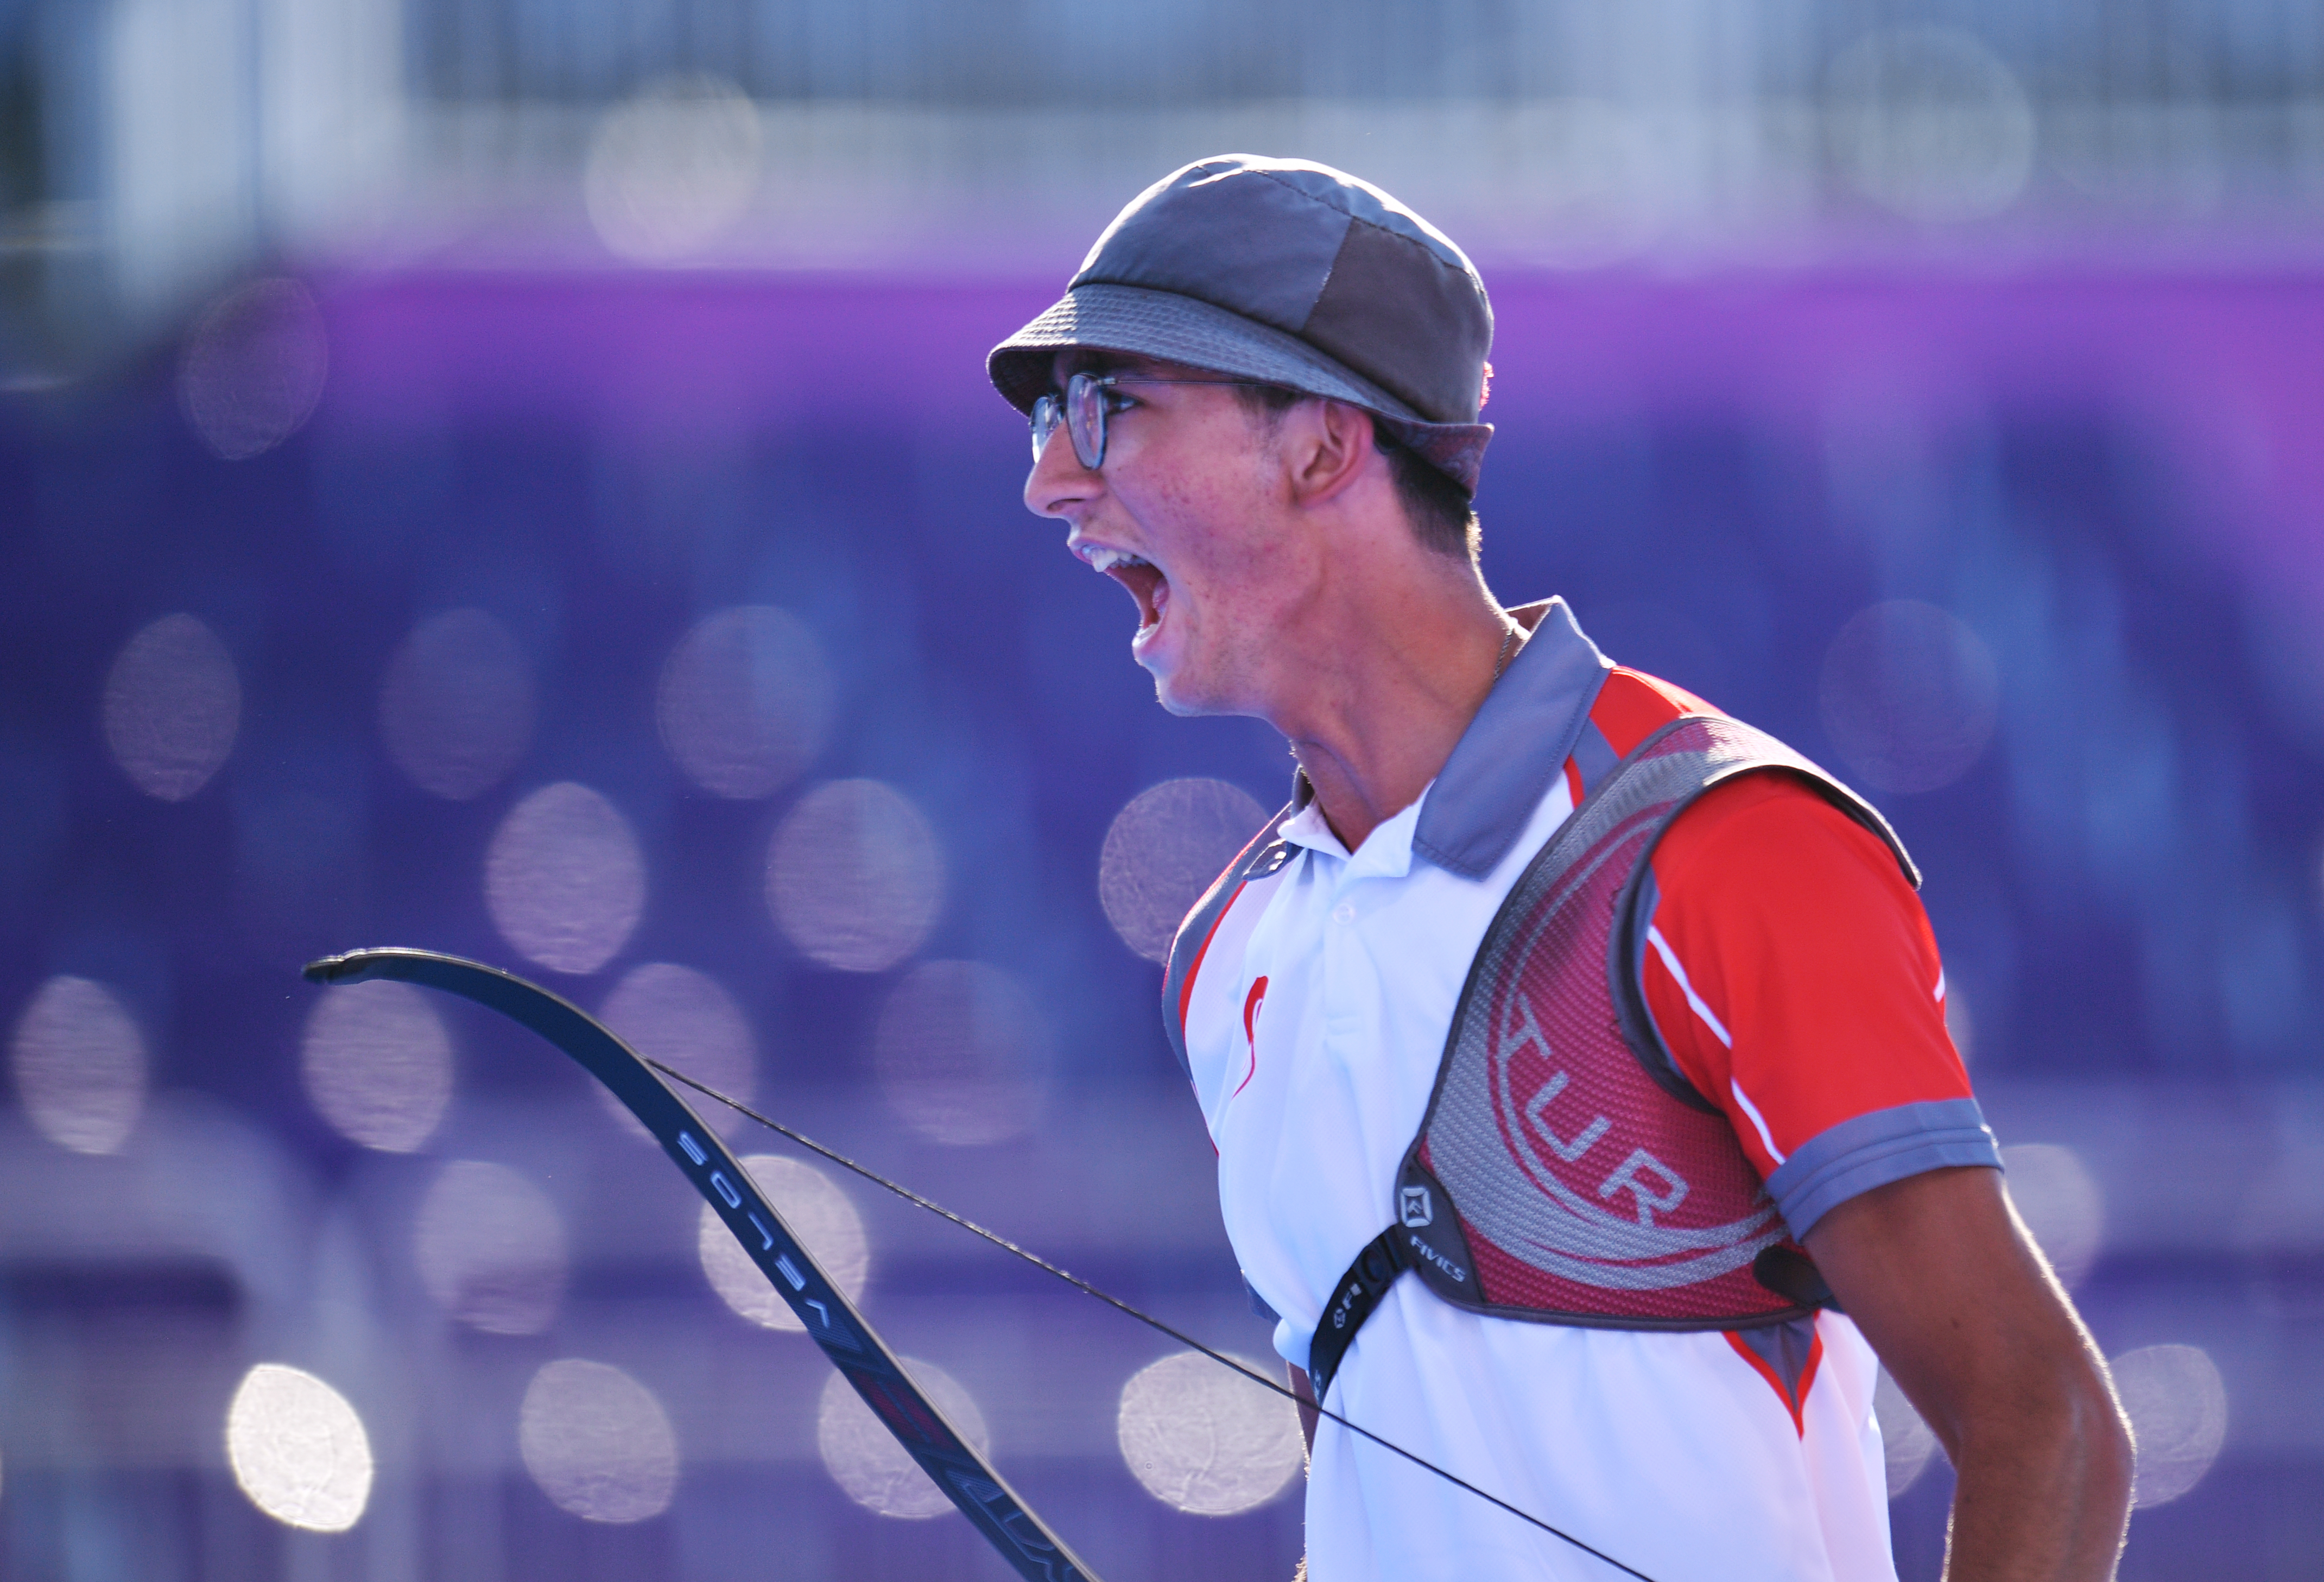 Tokyo 2020 Olympics - Archery - Men's Individual - Semifinal 2 - Yumenoshima Archery Field, Tokyo, Japan - July 31, 2021. Mete Gazoz of Turkey celebrates REUTERS/Clodagh Kilcoyne